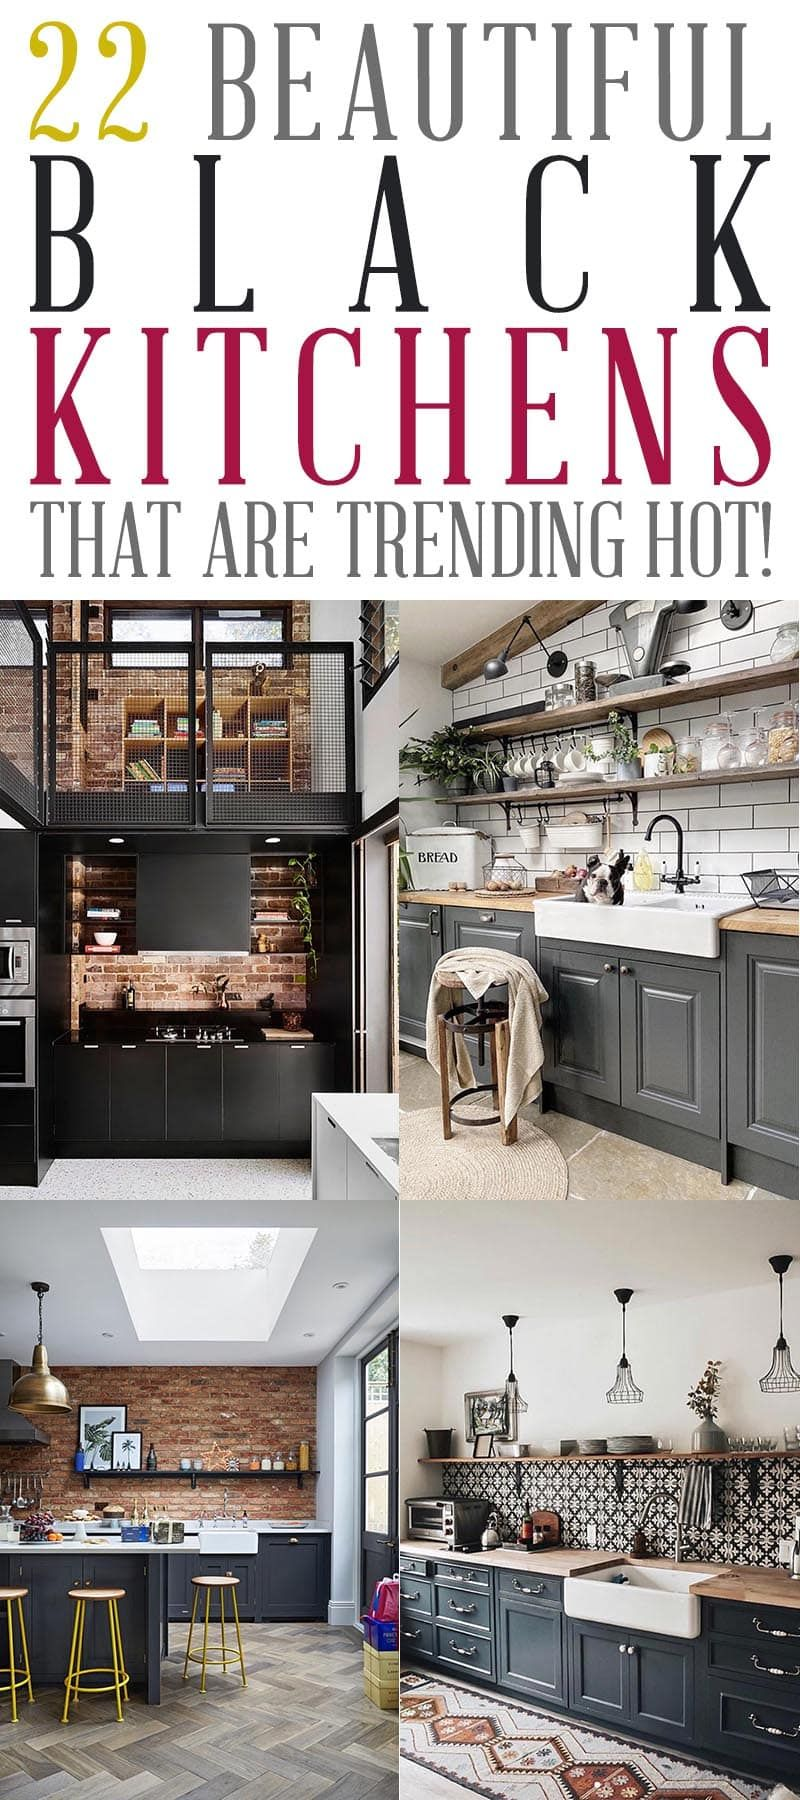 22 Beautiful Black Kitchens That Are Trending Hot The Cottage Market Black Kitchens Kitchen World Gorgeous Kitchens